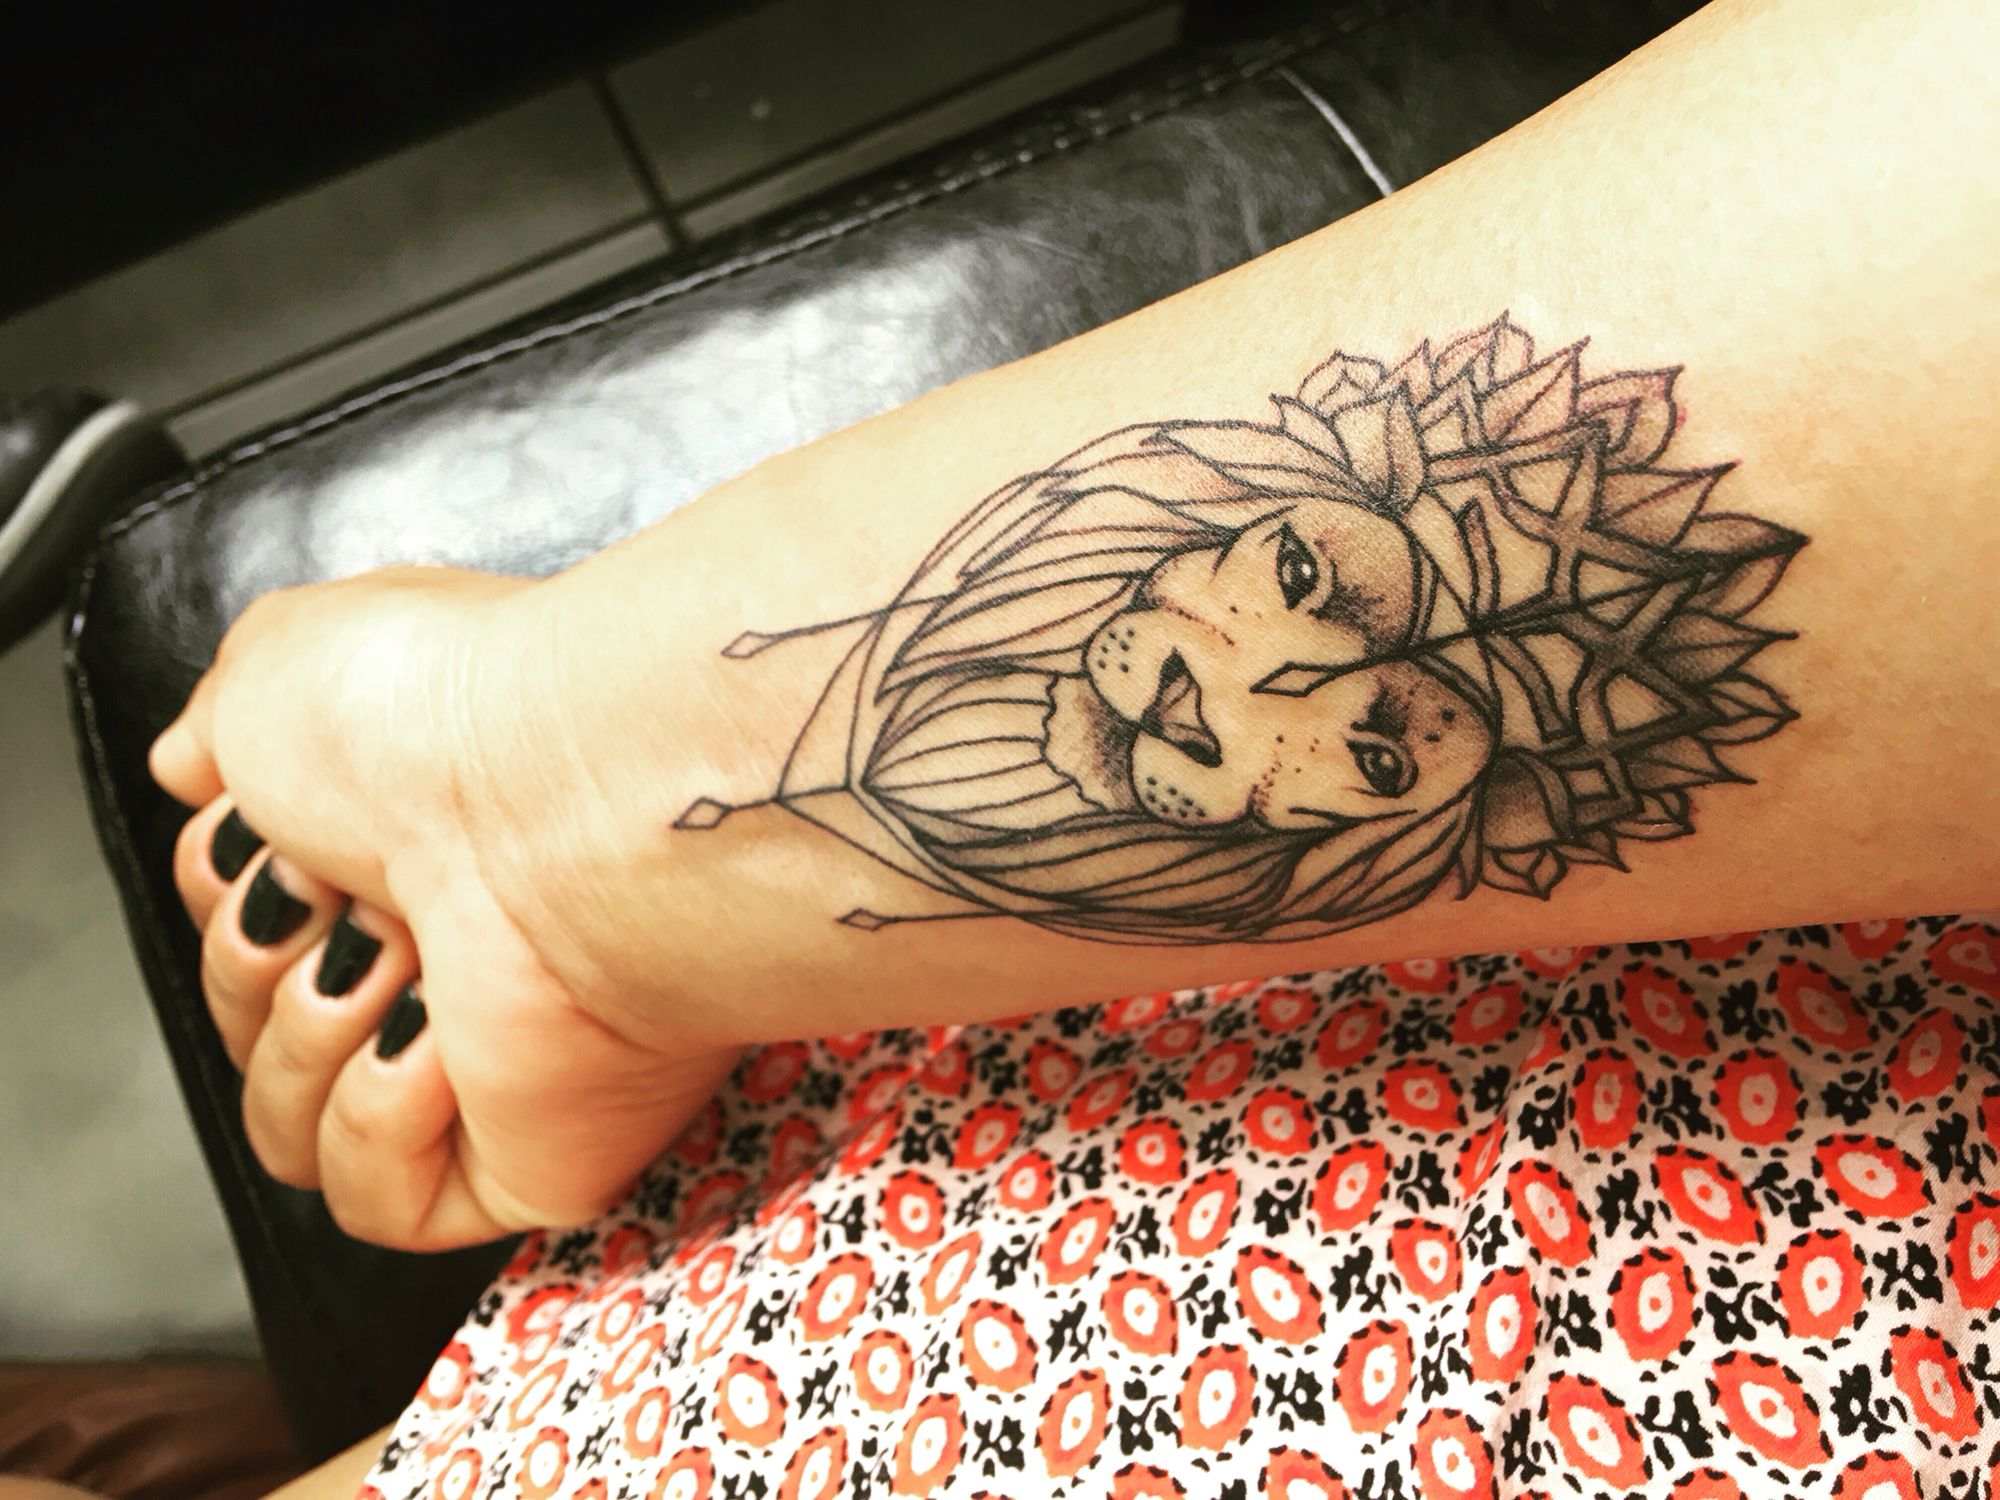 Finally, my first ink! Lioness tattoo, lion goddess, wrist